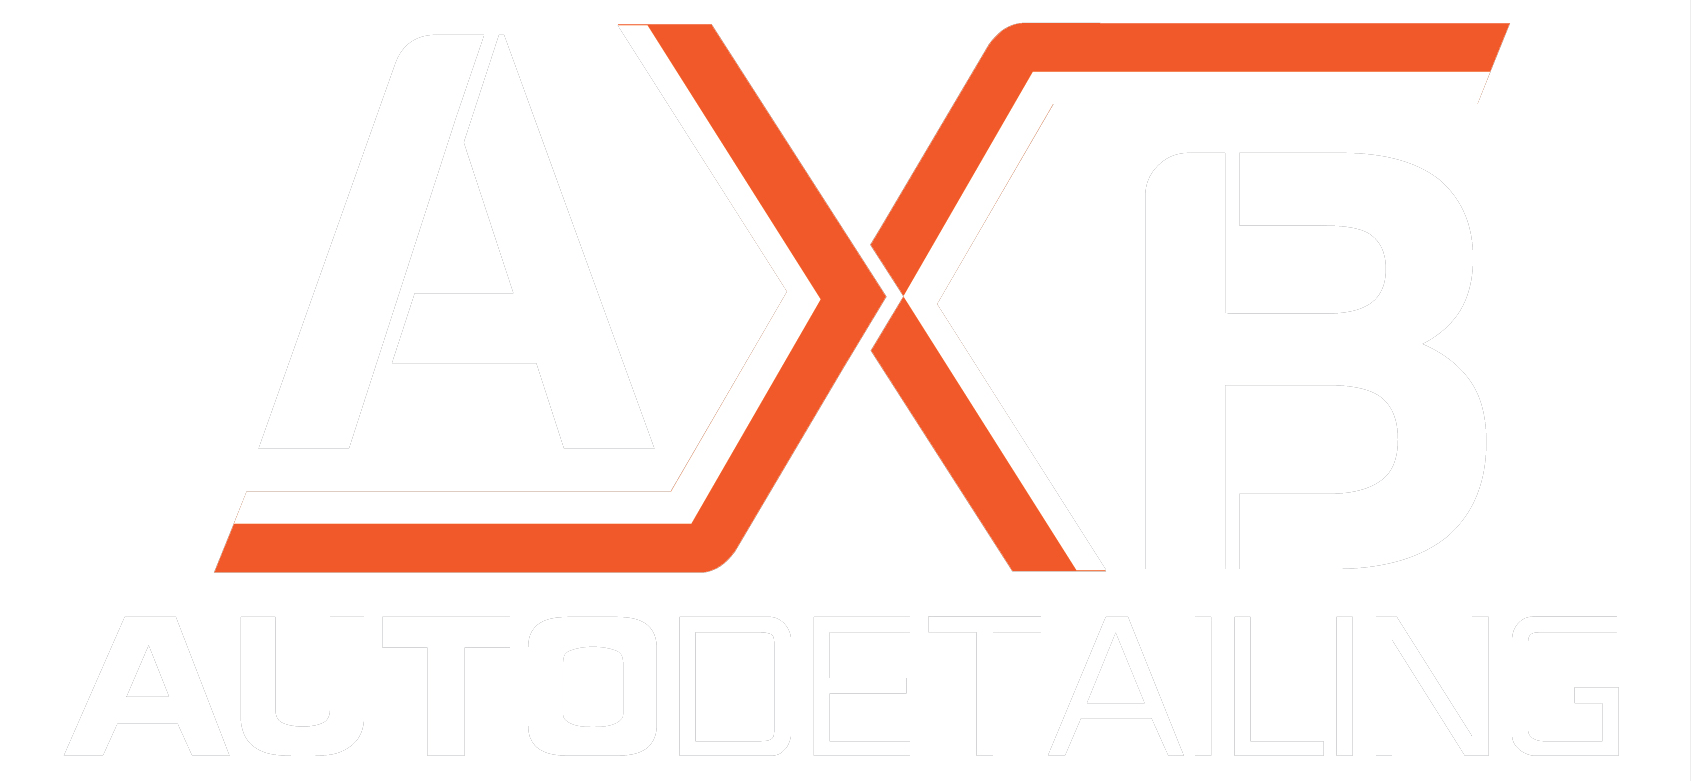 AXB Auto Detailing